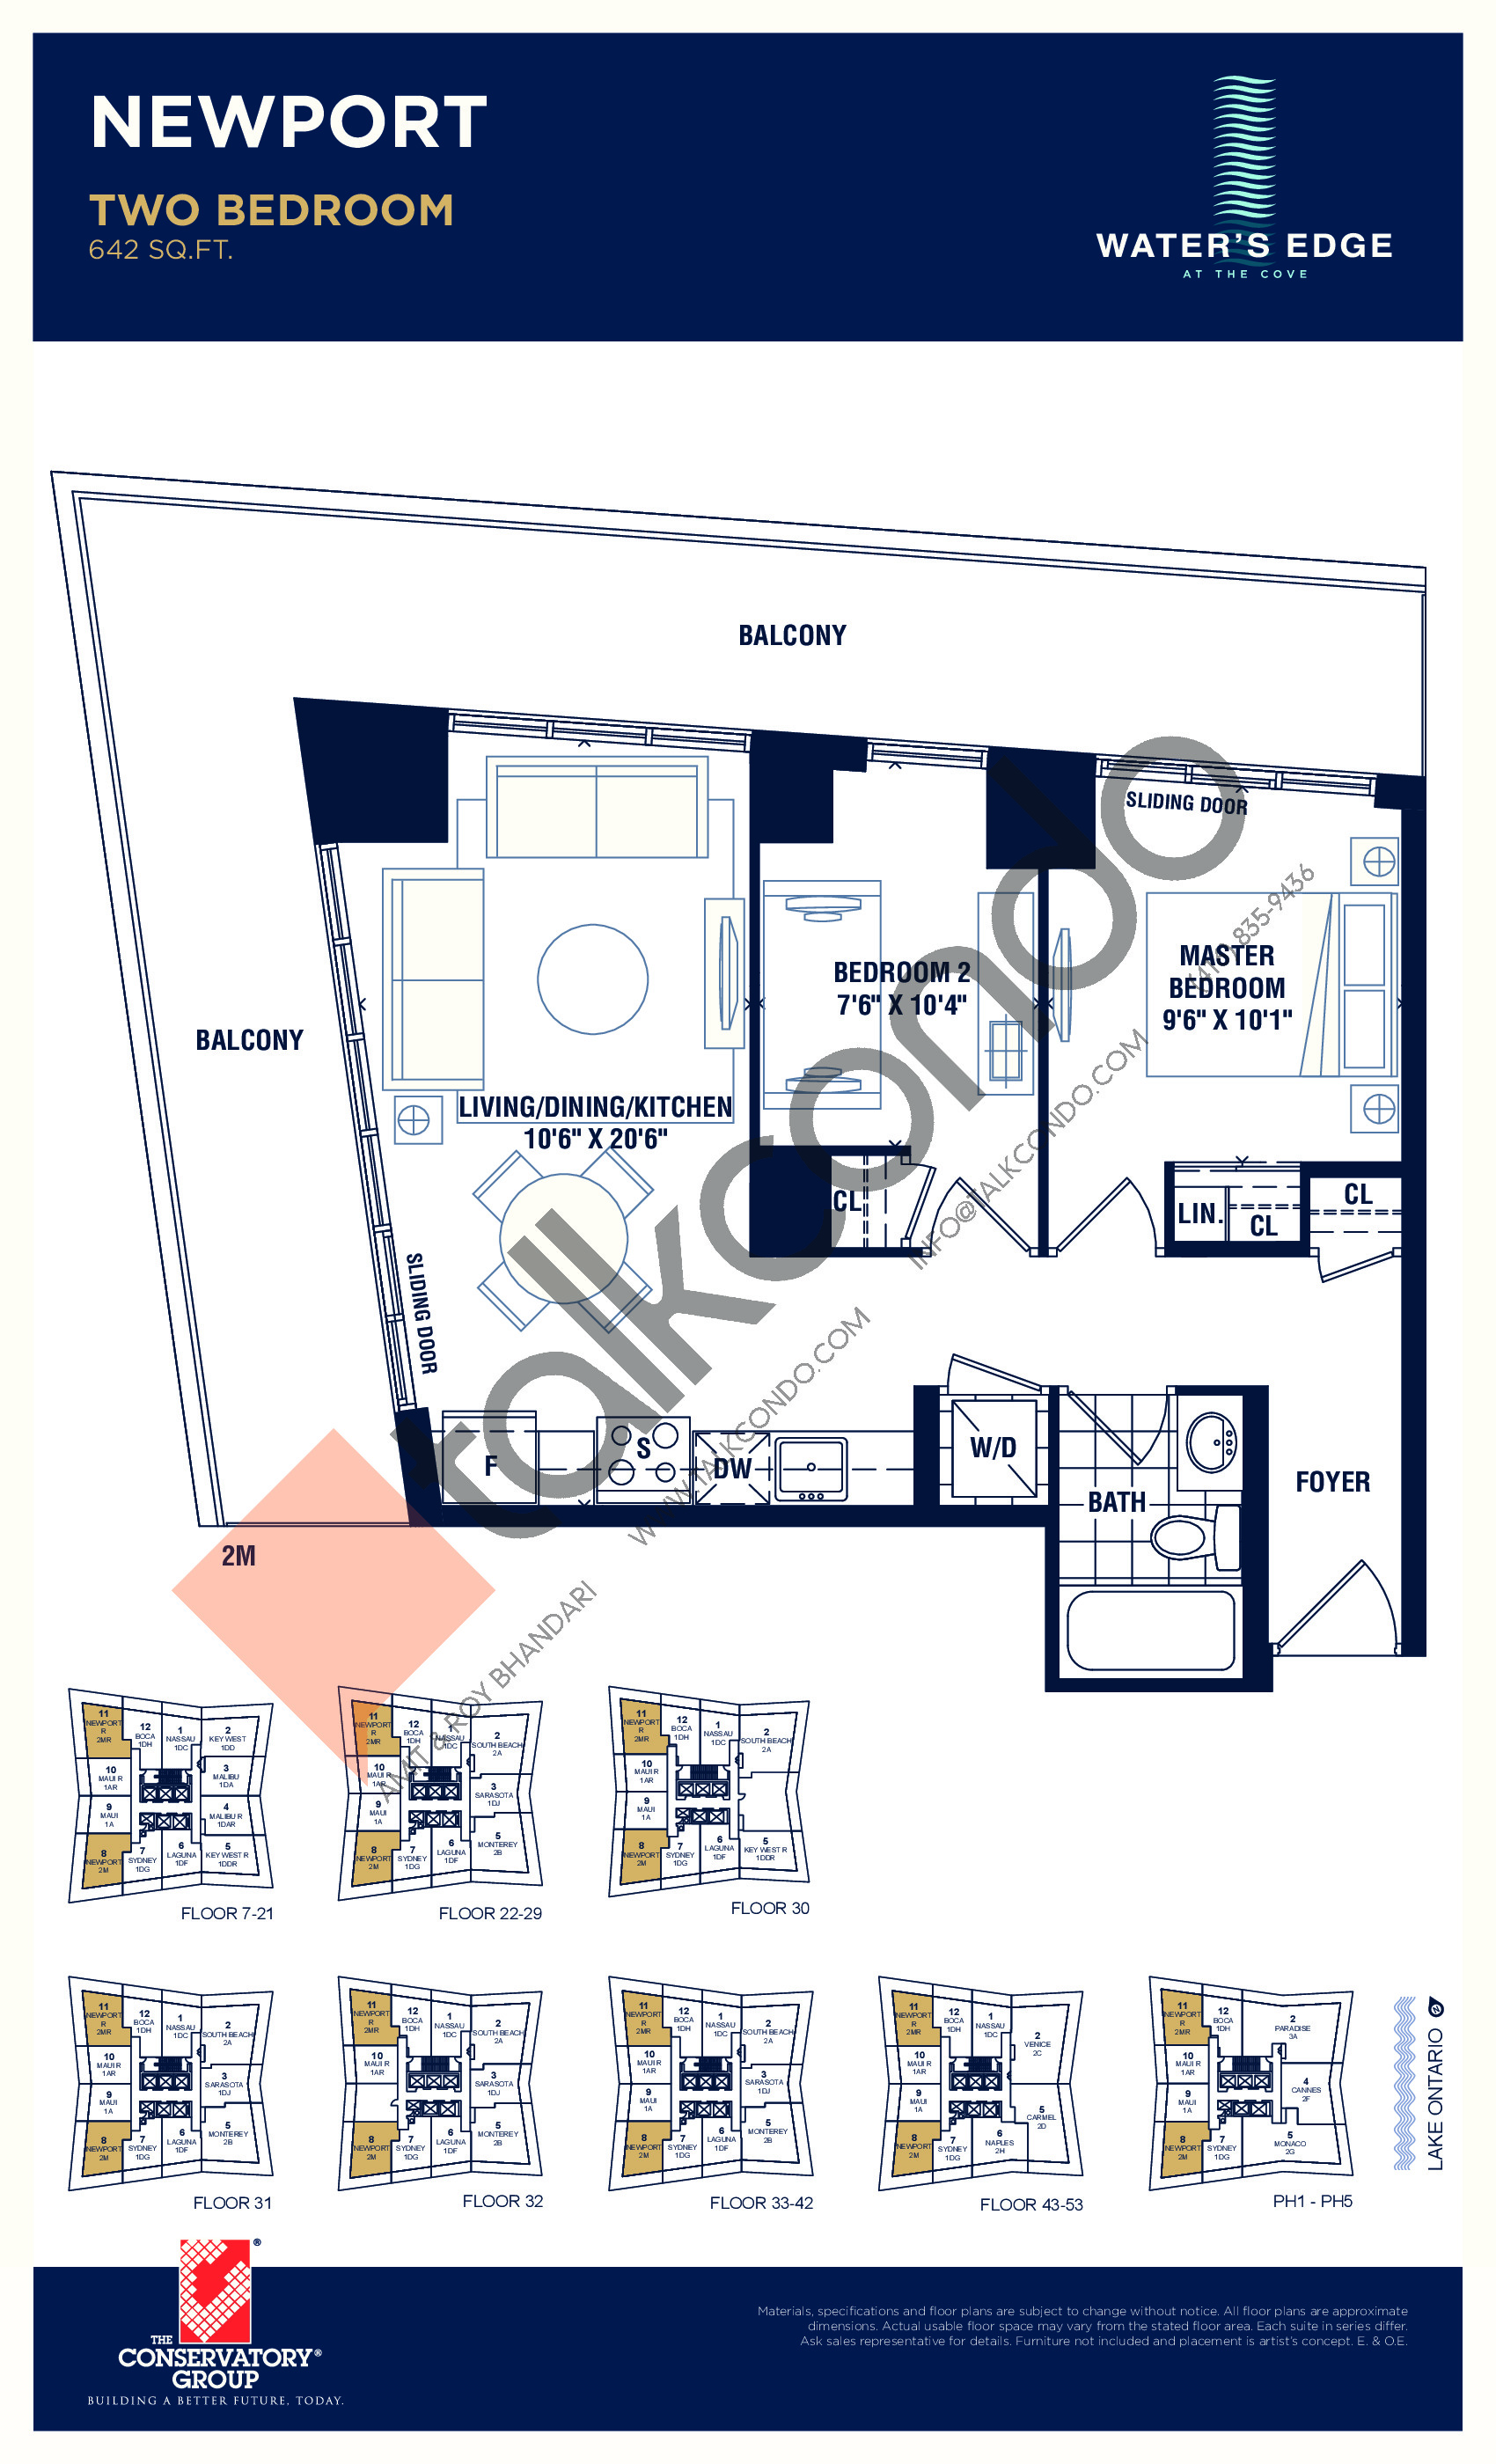 Newport Floor Plan at Water's Edge at the Cove Condos - 642 sq.ft